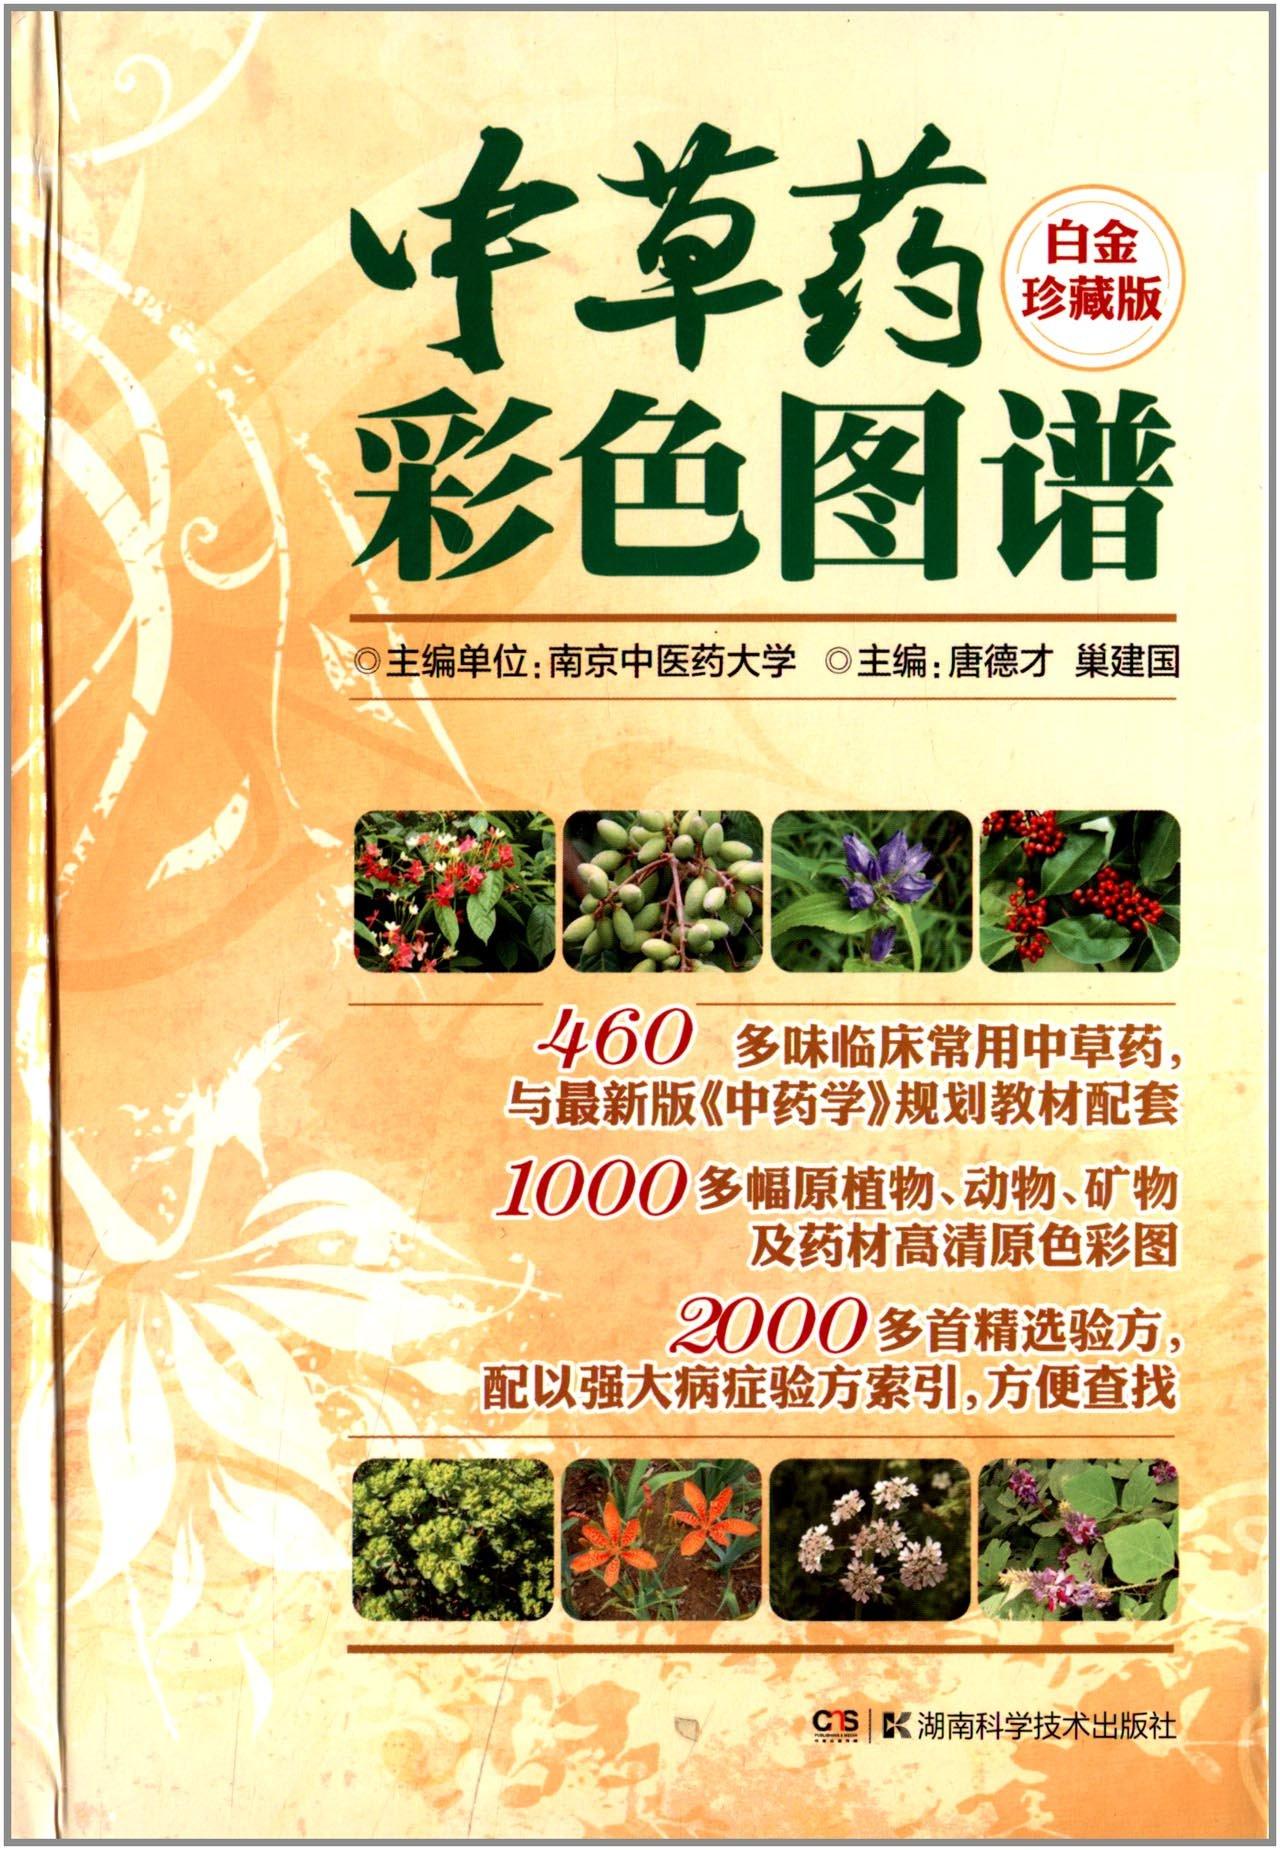 Read Online Color Atlas of Chinese herbal medicine Platinum Edition - 中草药彩色图谱 白金珍藏版 pdf epub